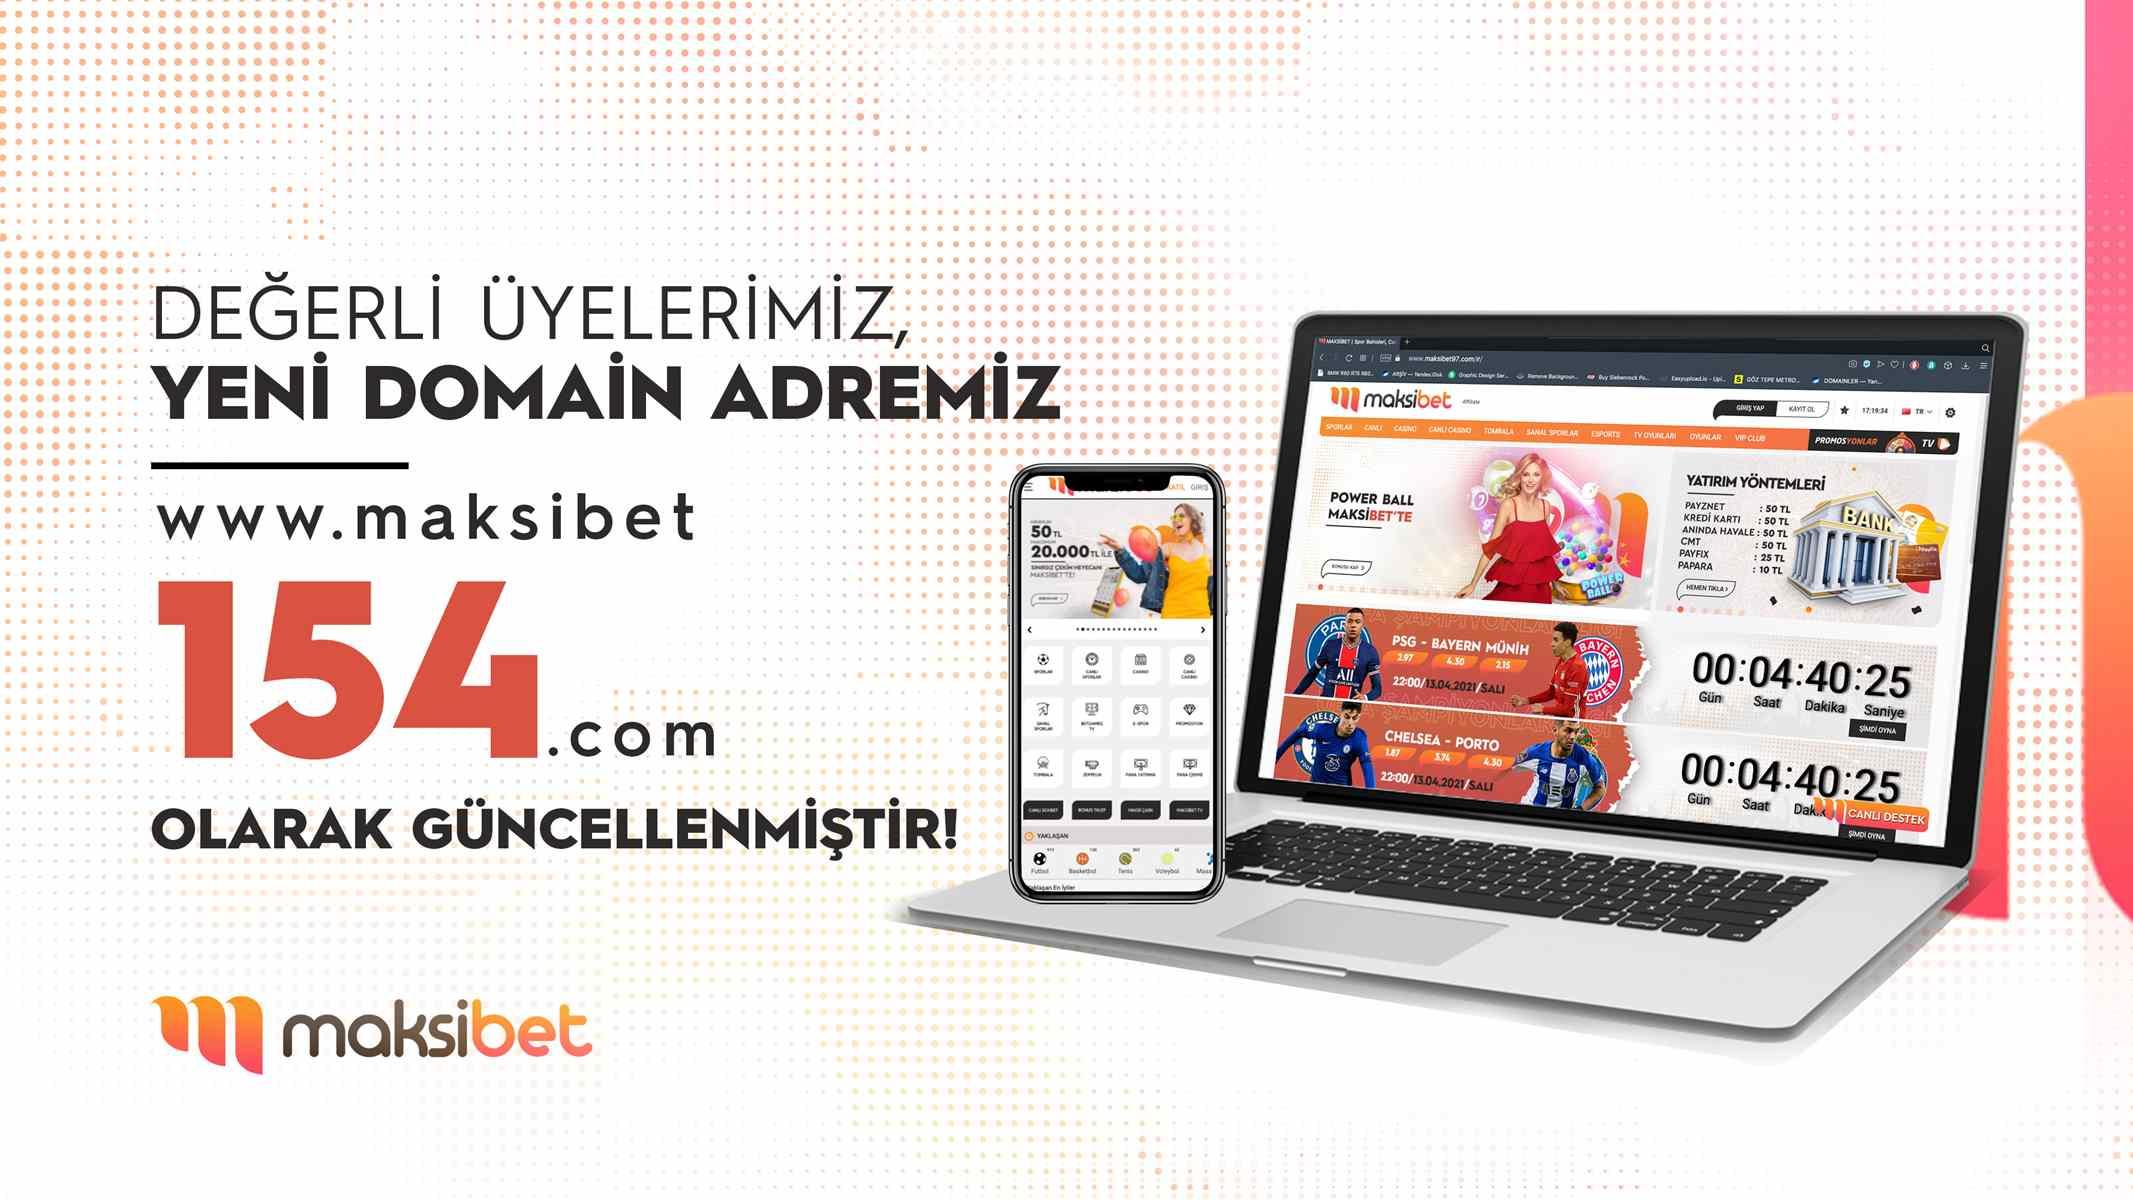 Maksibet Giriş - Maksibet Güncel Twitter Giriş - Maksi 154